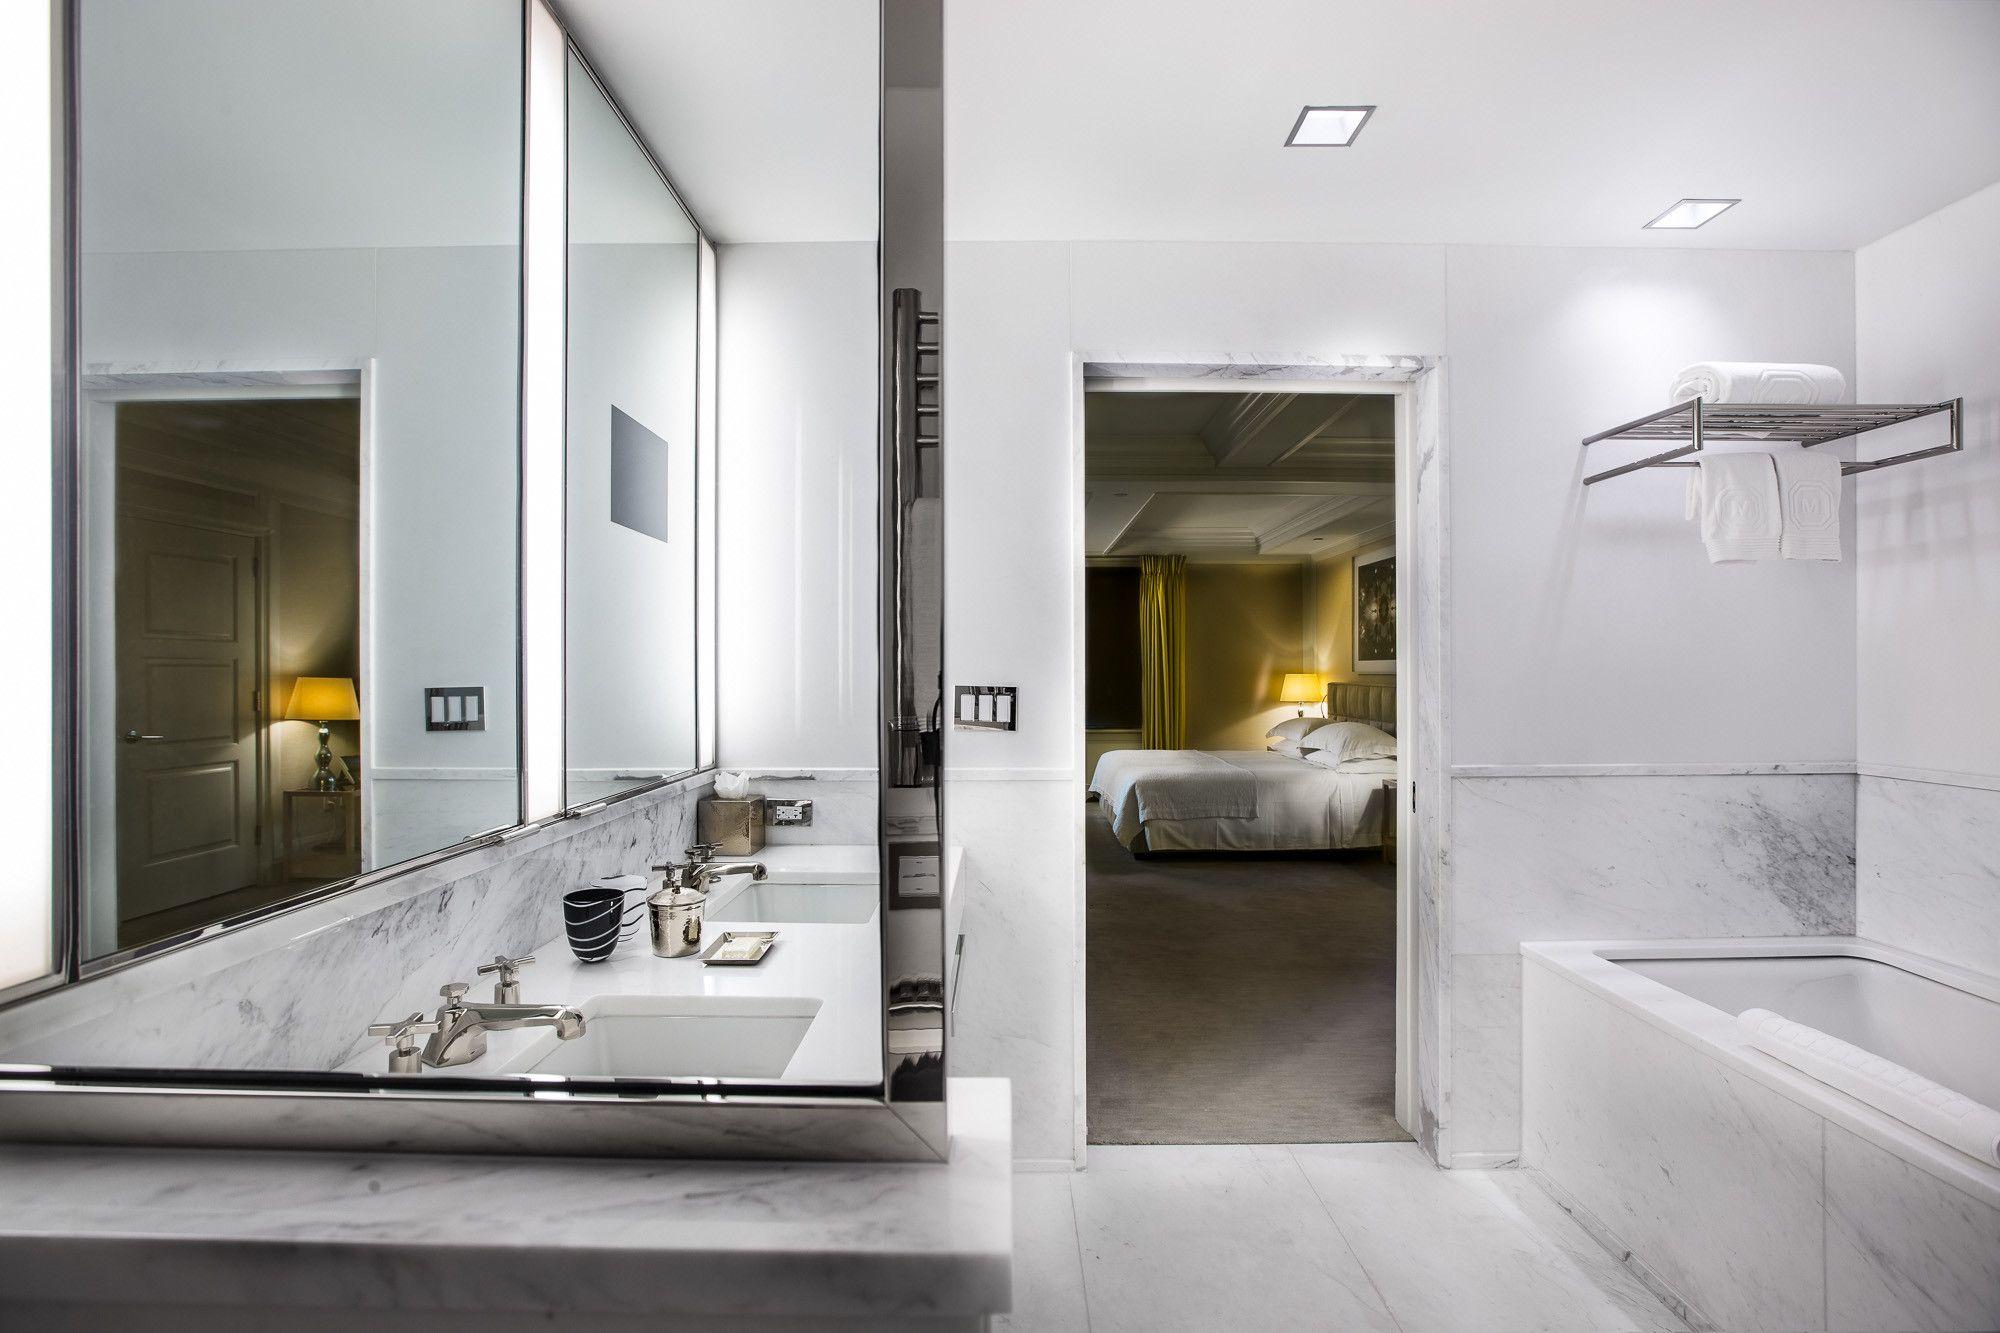 Hotels Manhattan New York | The Mark Hotel – Gallery | 5 Star Hotels ...